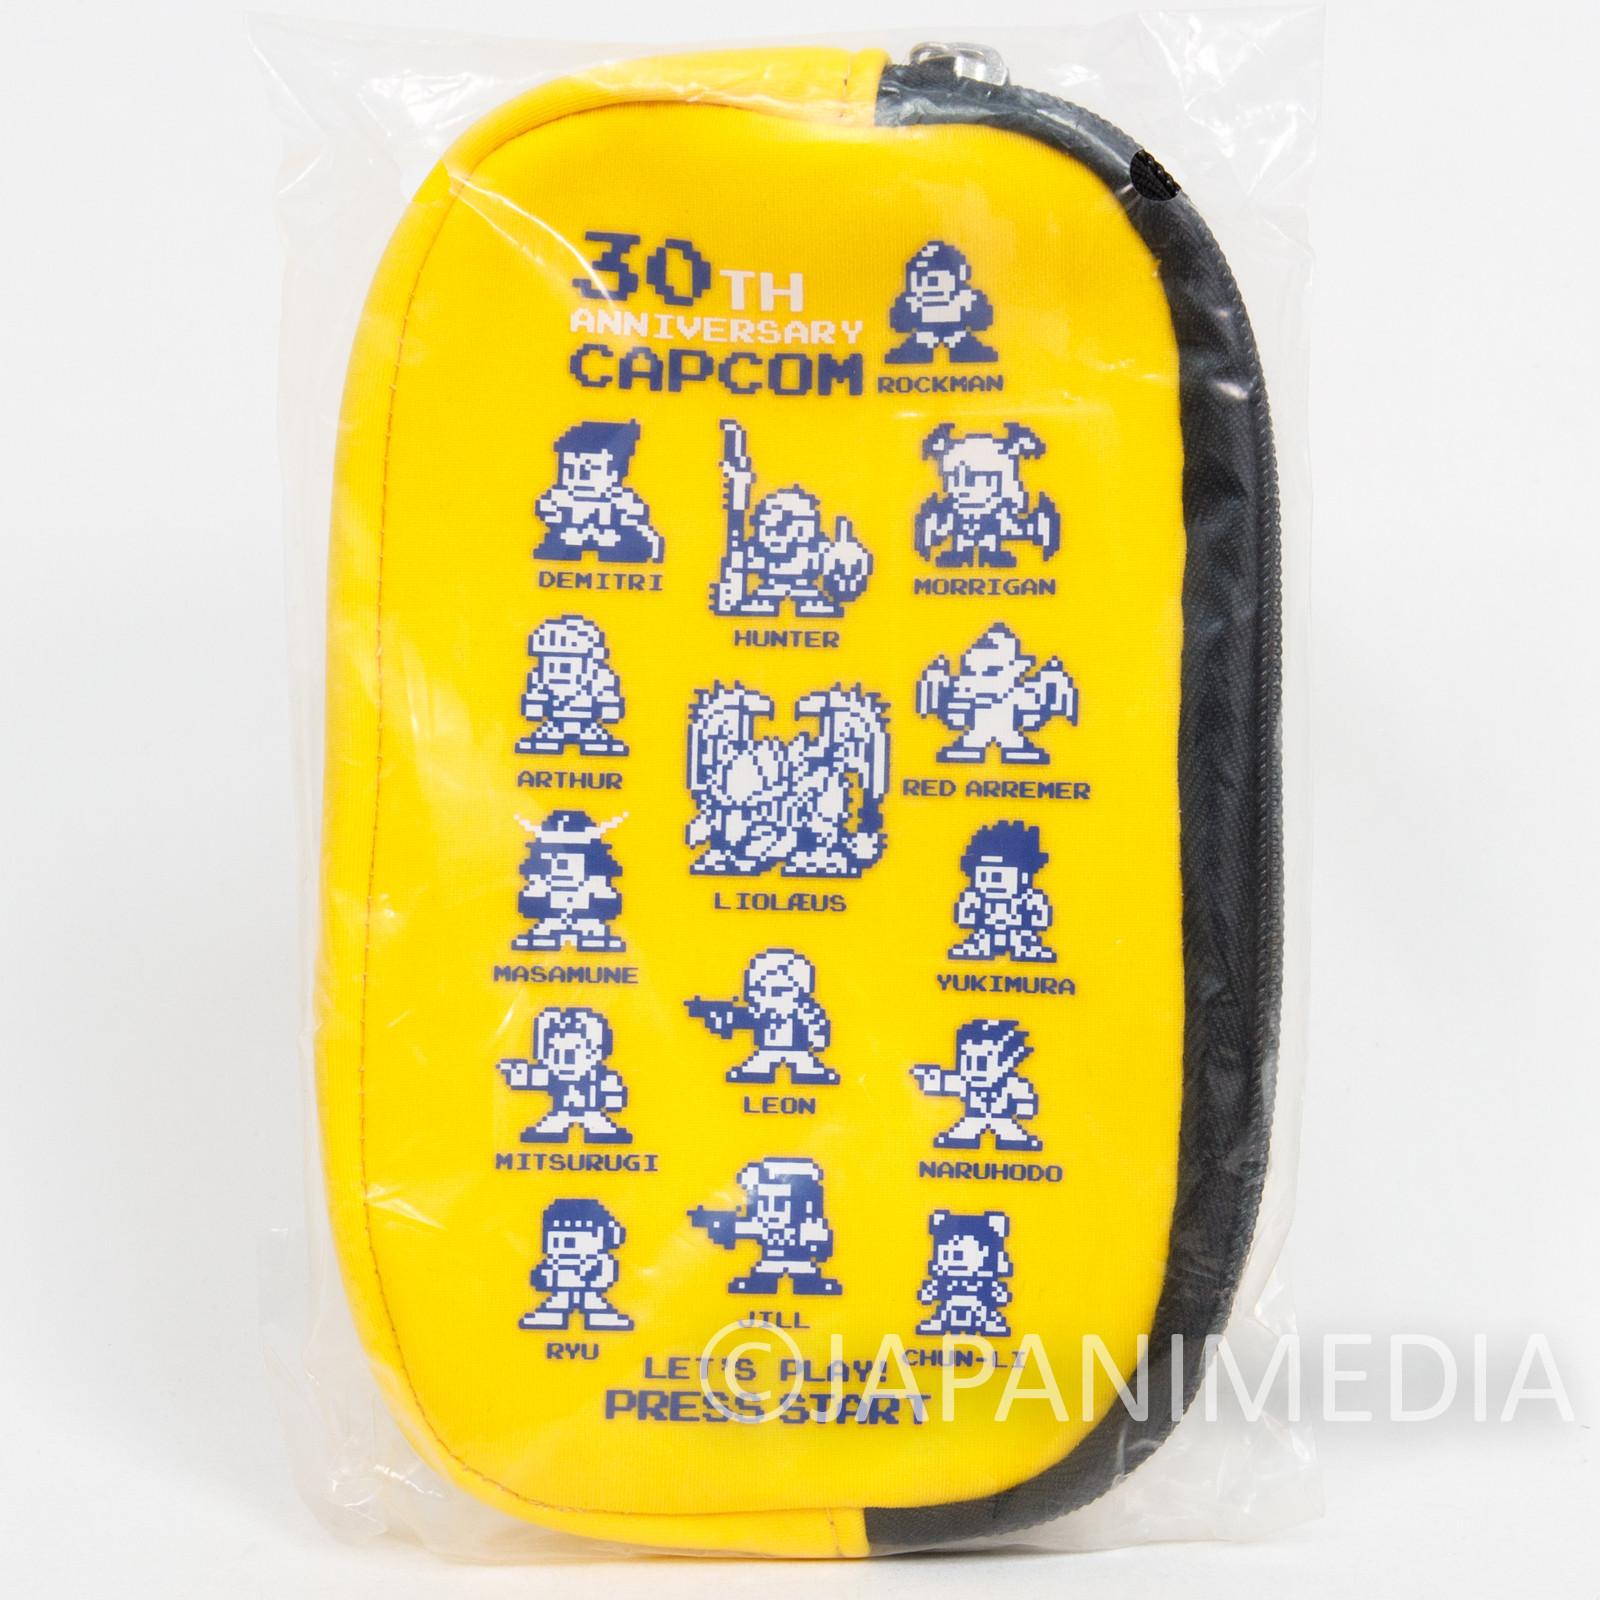 Capcom Character Design 30th Mini Pouch Case Rockman Morrigan JAPAN ANIME GAME